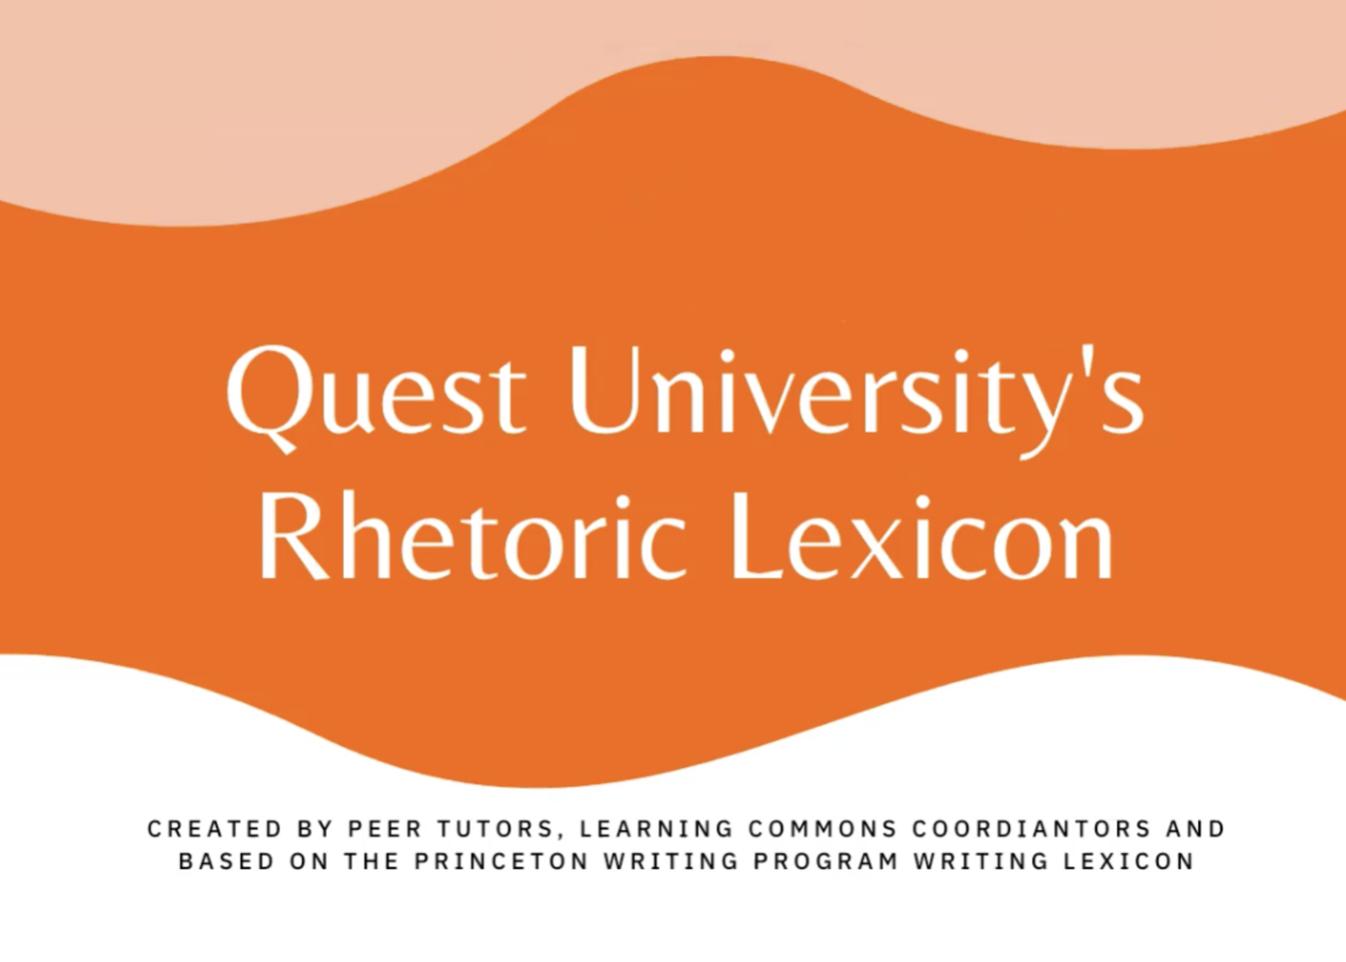 Quest University's Rhetoric Lexicon